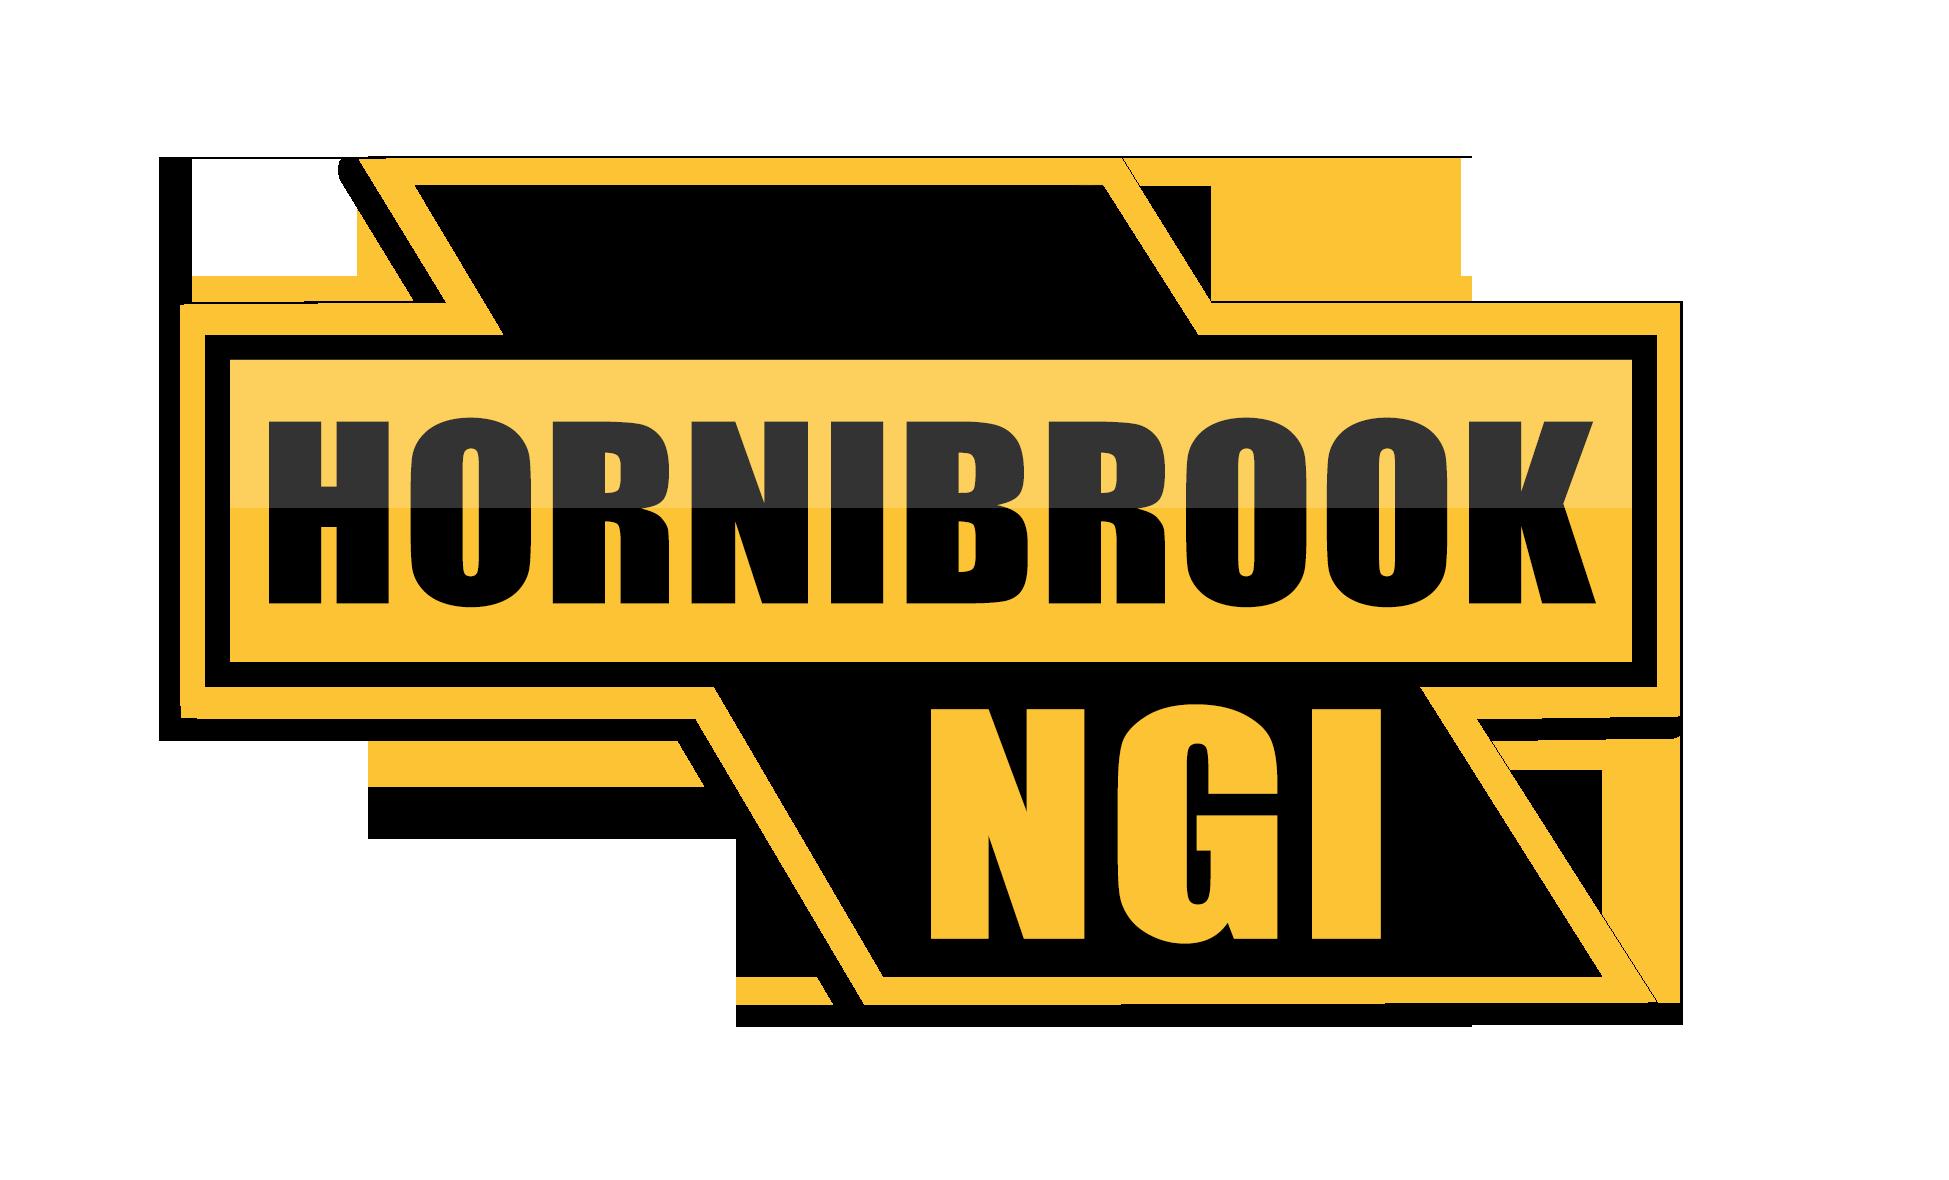 Hornibrook